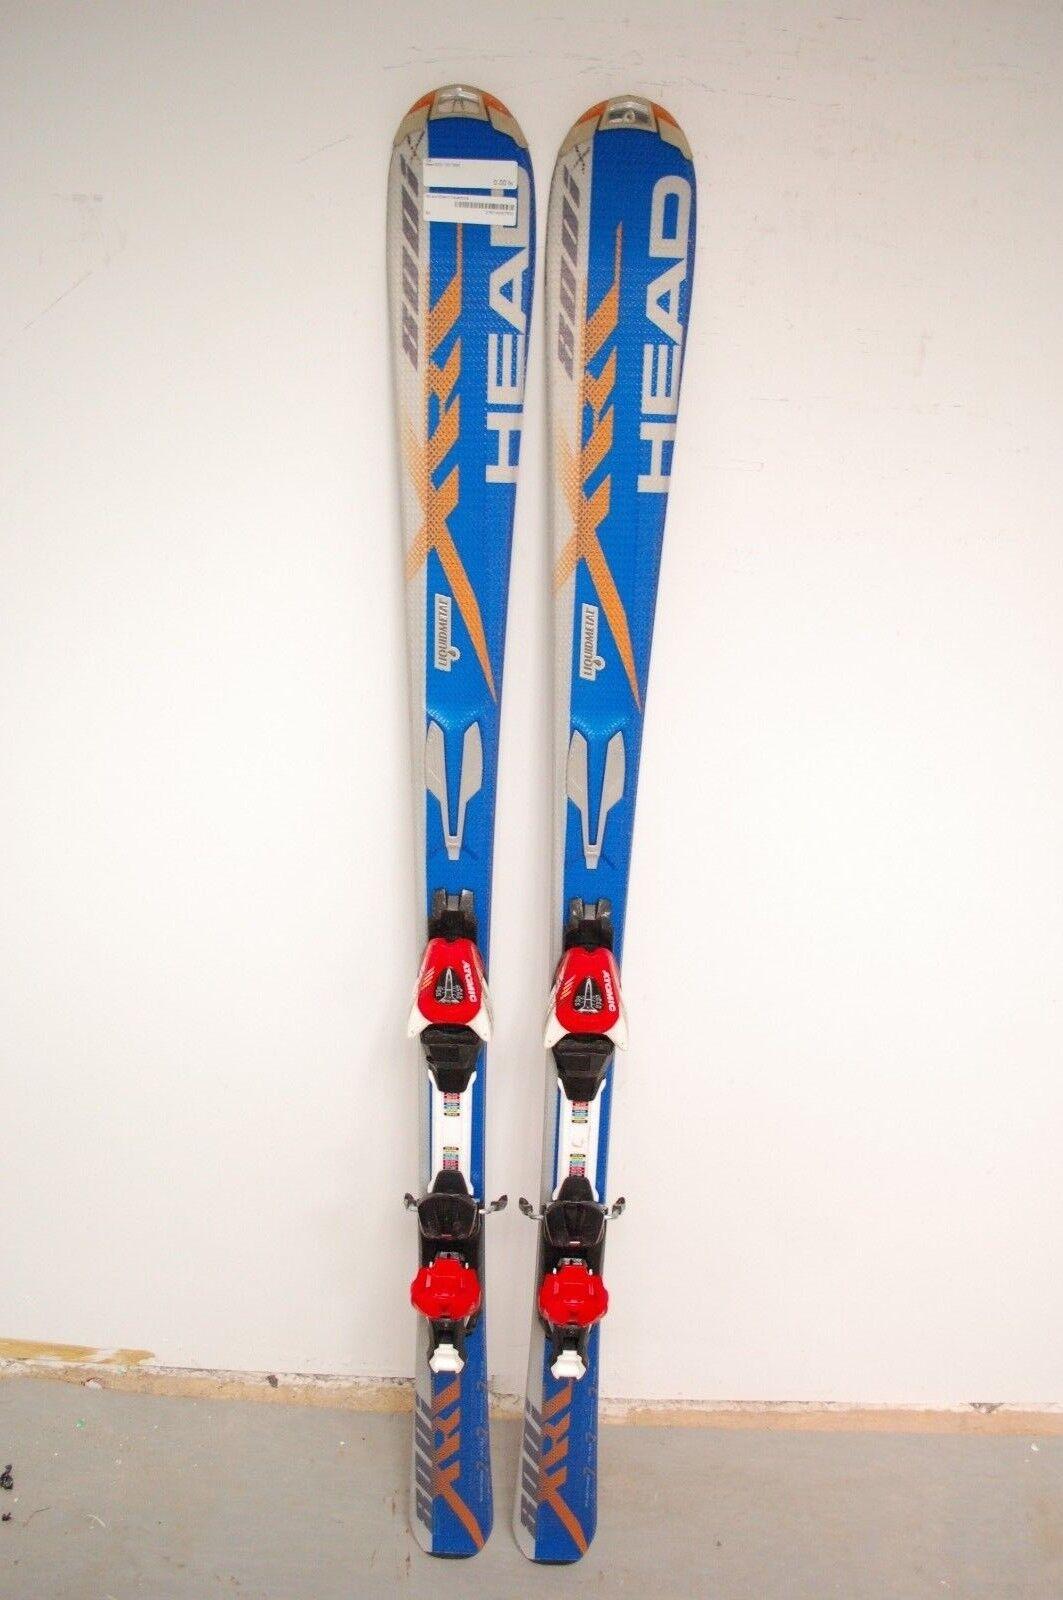 HEAD XRC 800i 156 cm Ski + Bindings Atomic XTE 7.5 Bindings + 97de4f